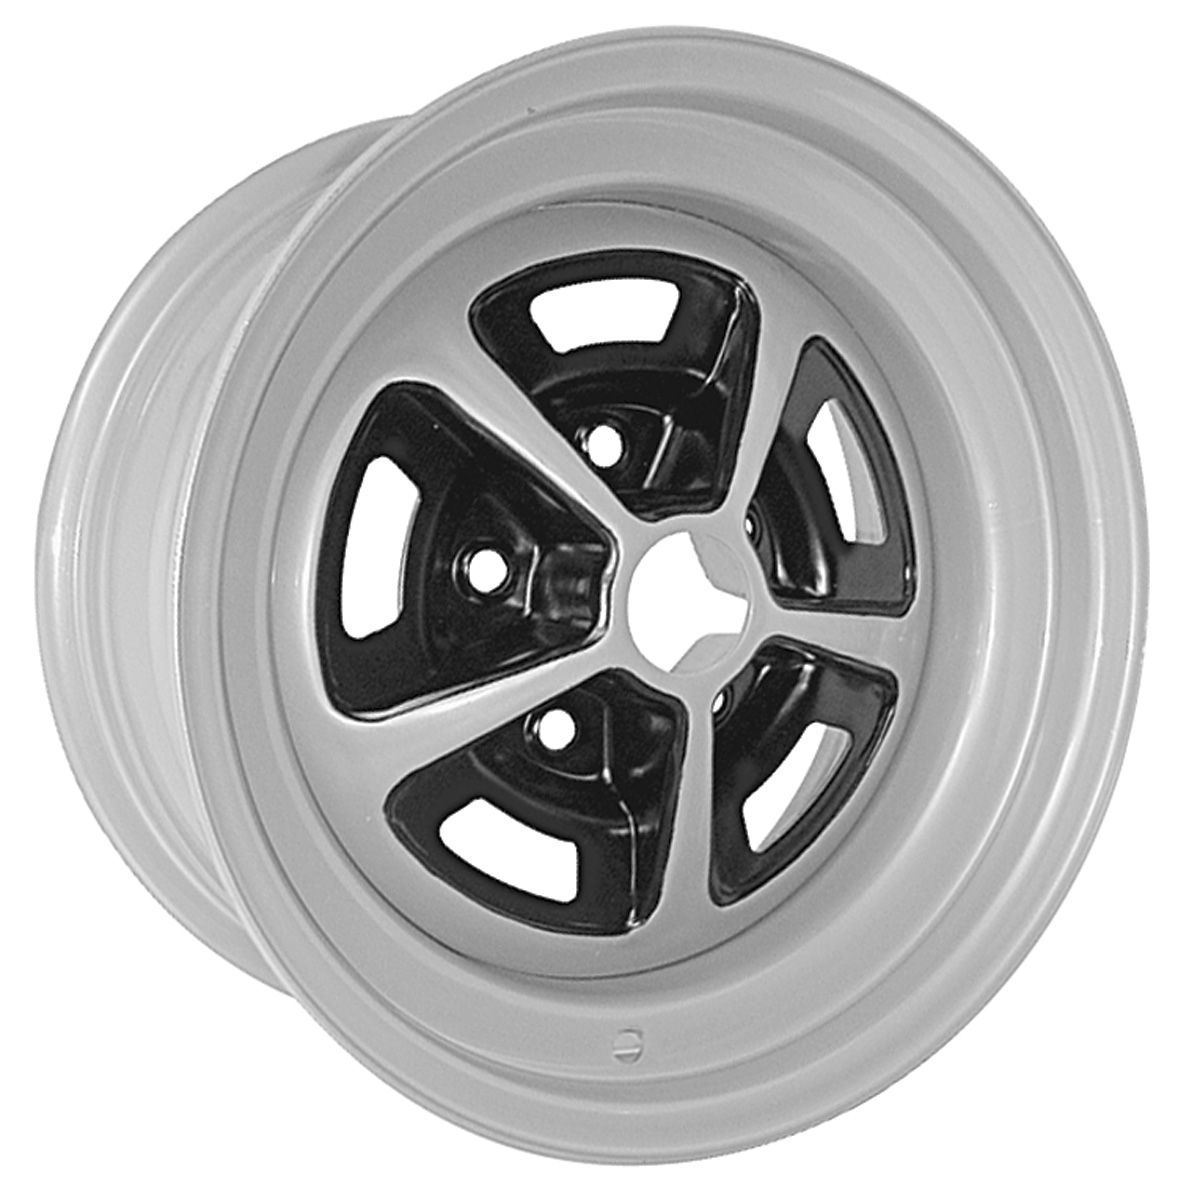 "Wheel, Super Sport, 15X8, 4-1/2"" Back Spacing"